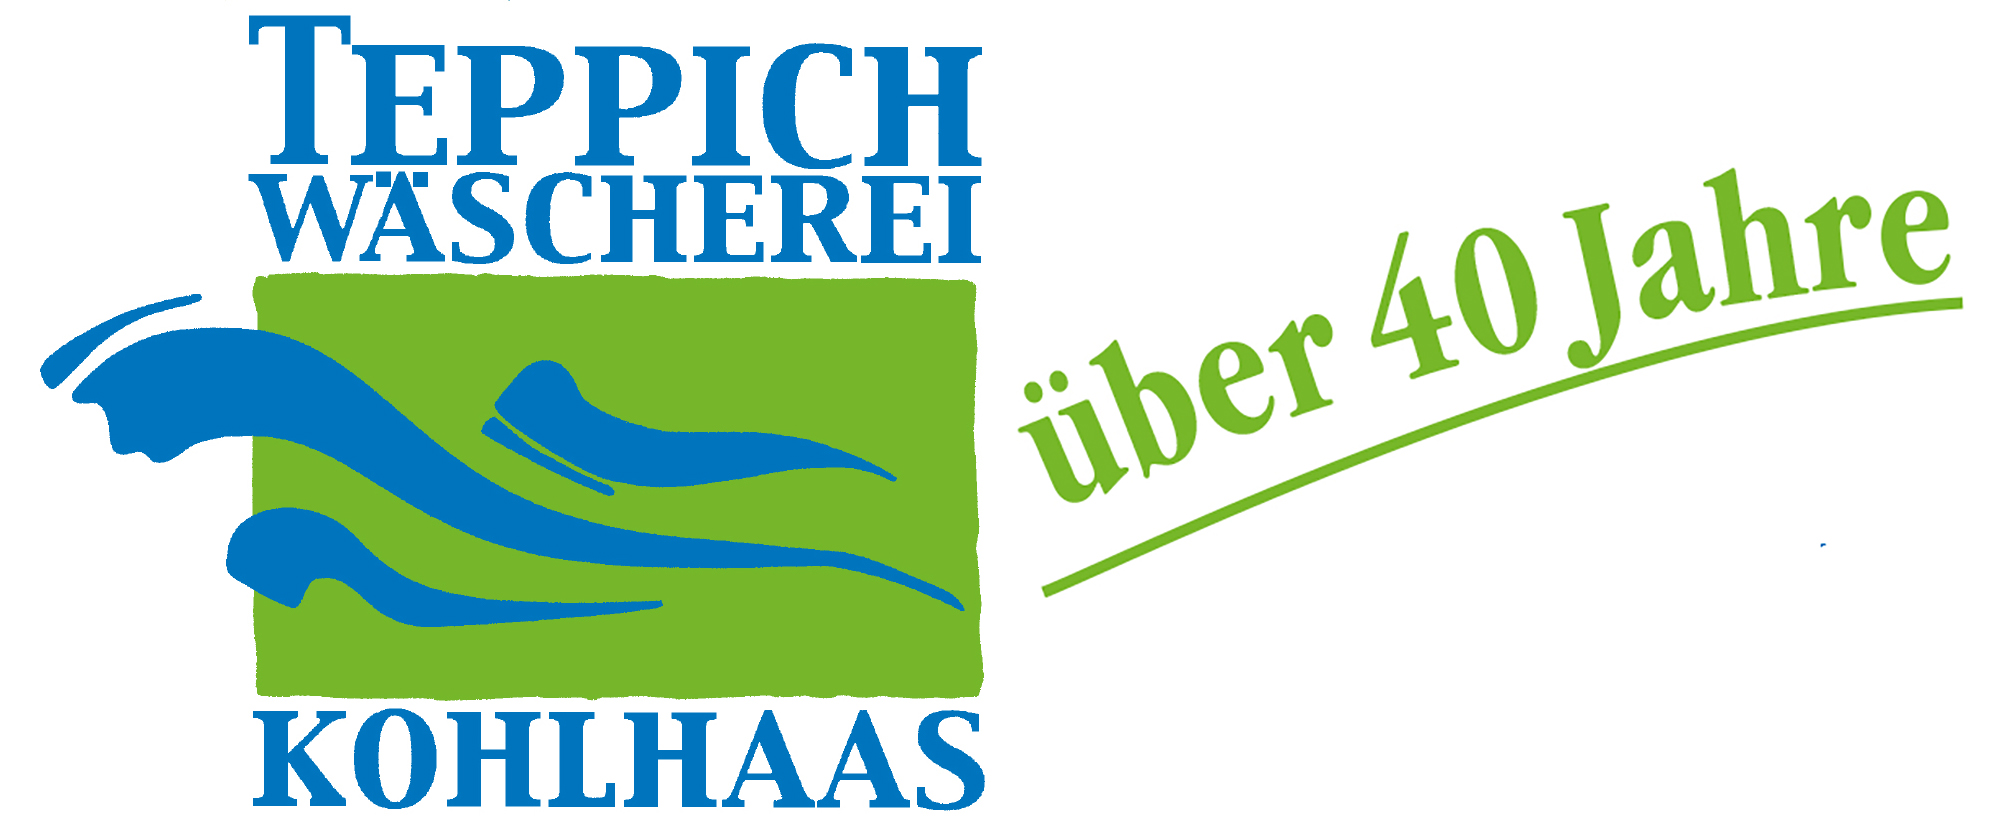 kohlhaas_logo_mobile_2021